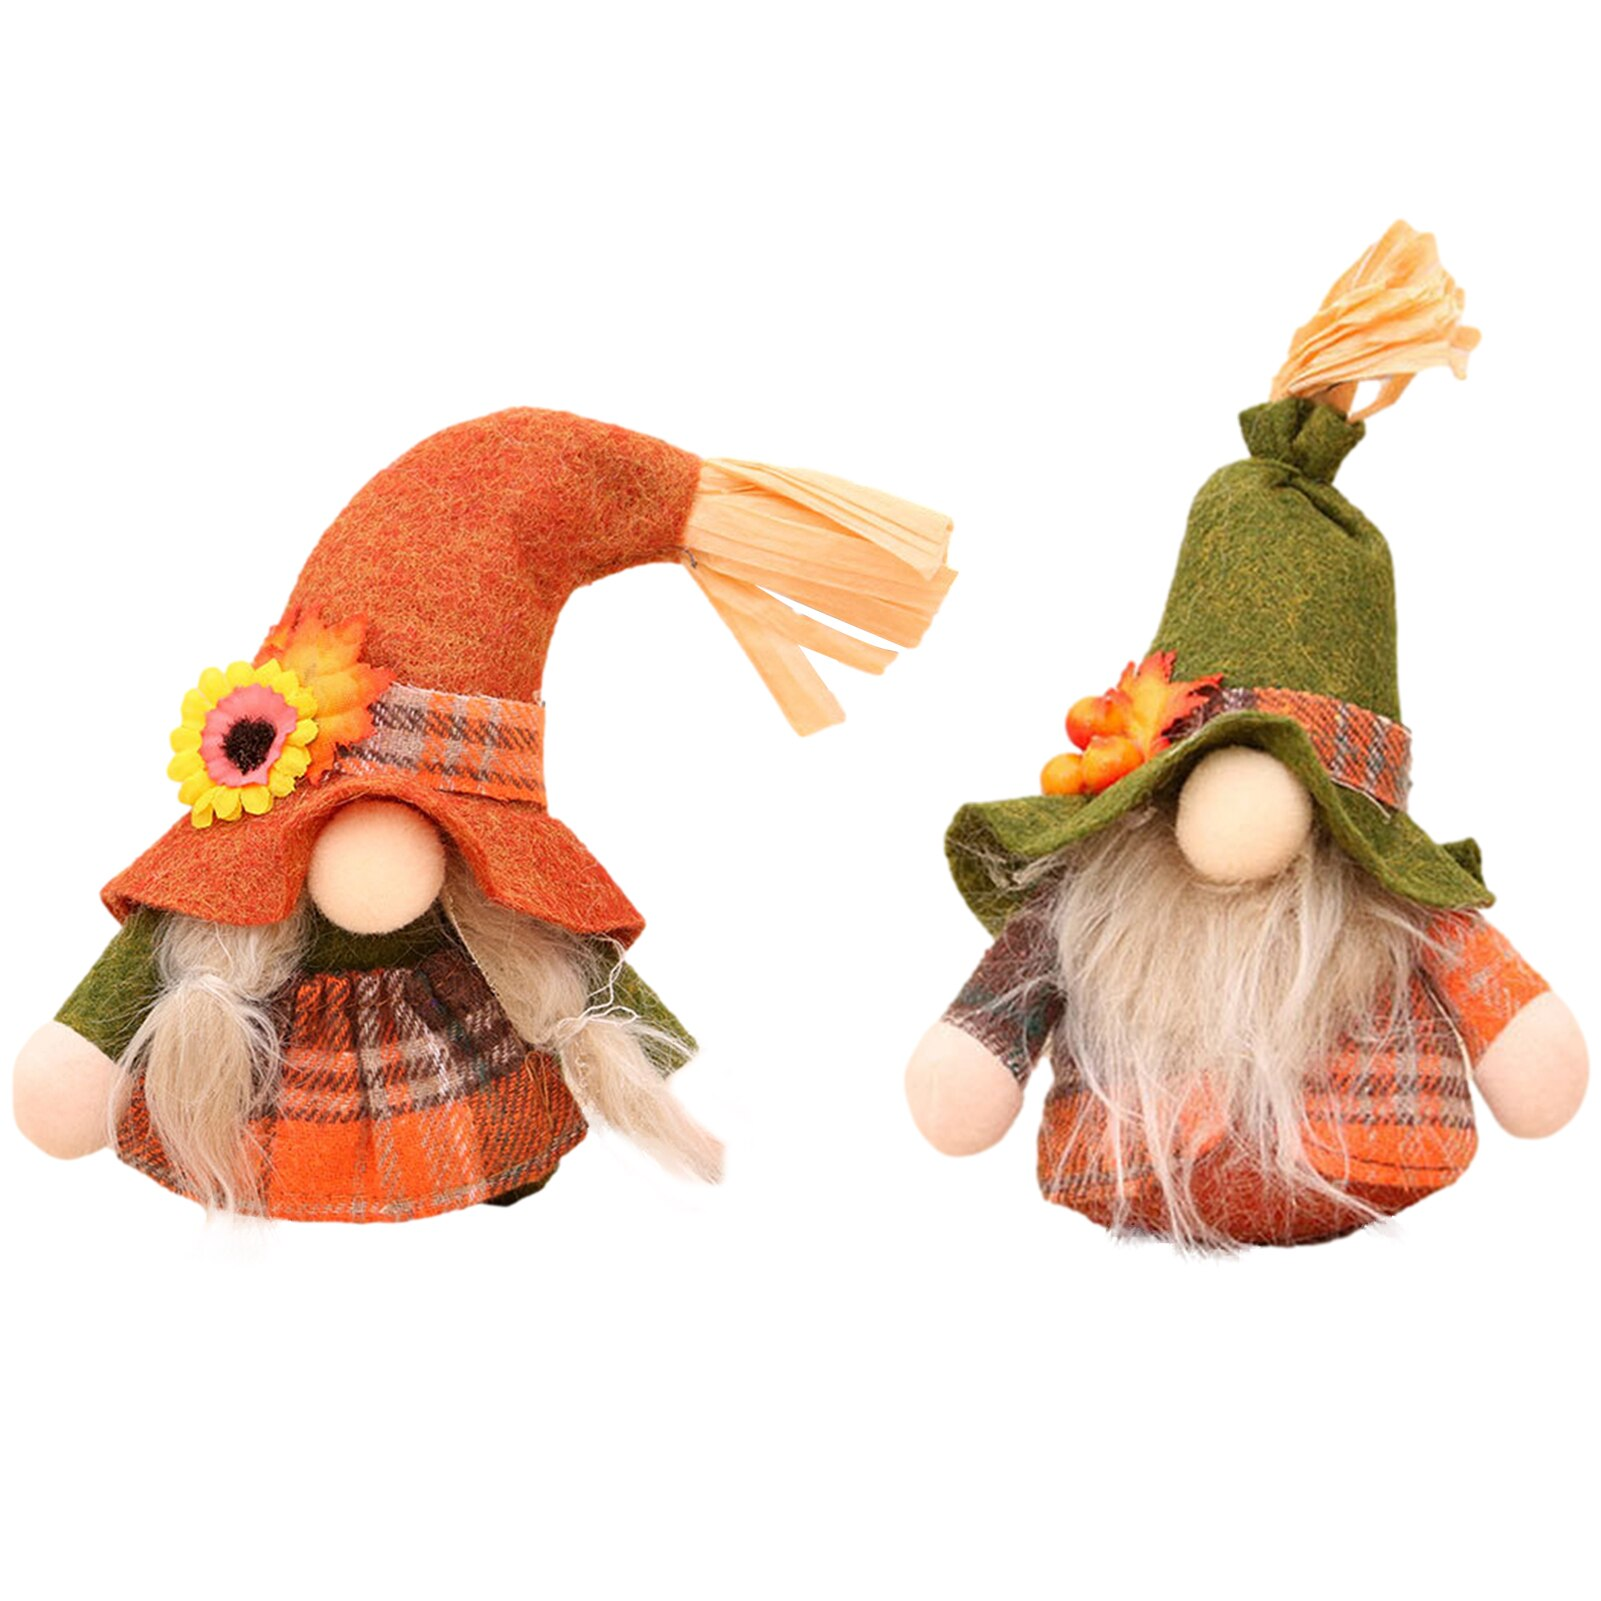 Christmas Faceless Gnome Plush Doll Santa Rudolph Festival Dwarf For Holiday Decoration Xmas Home Decor